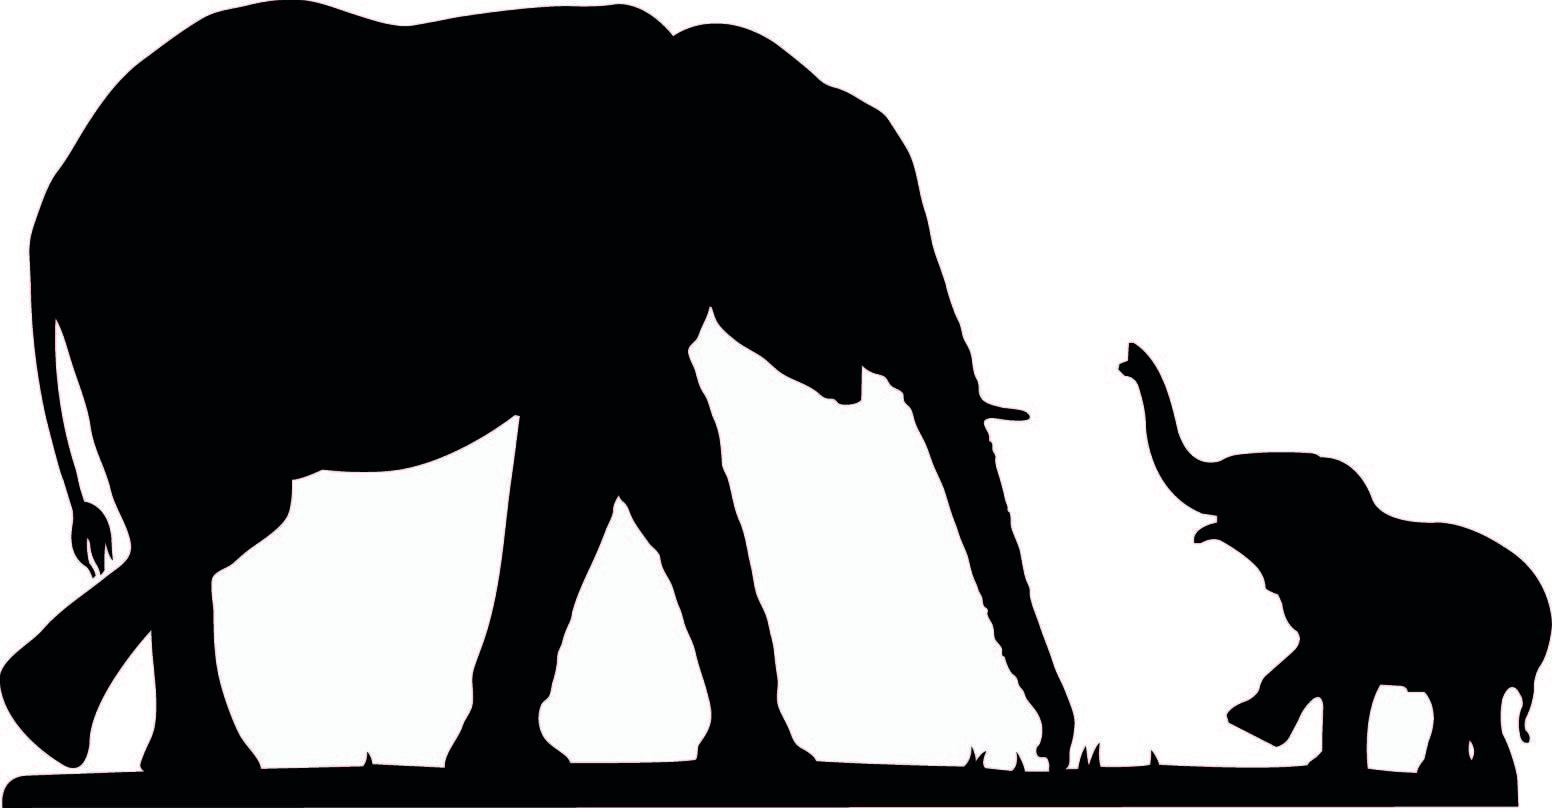 Cute Elephant Silhouette.